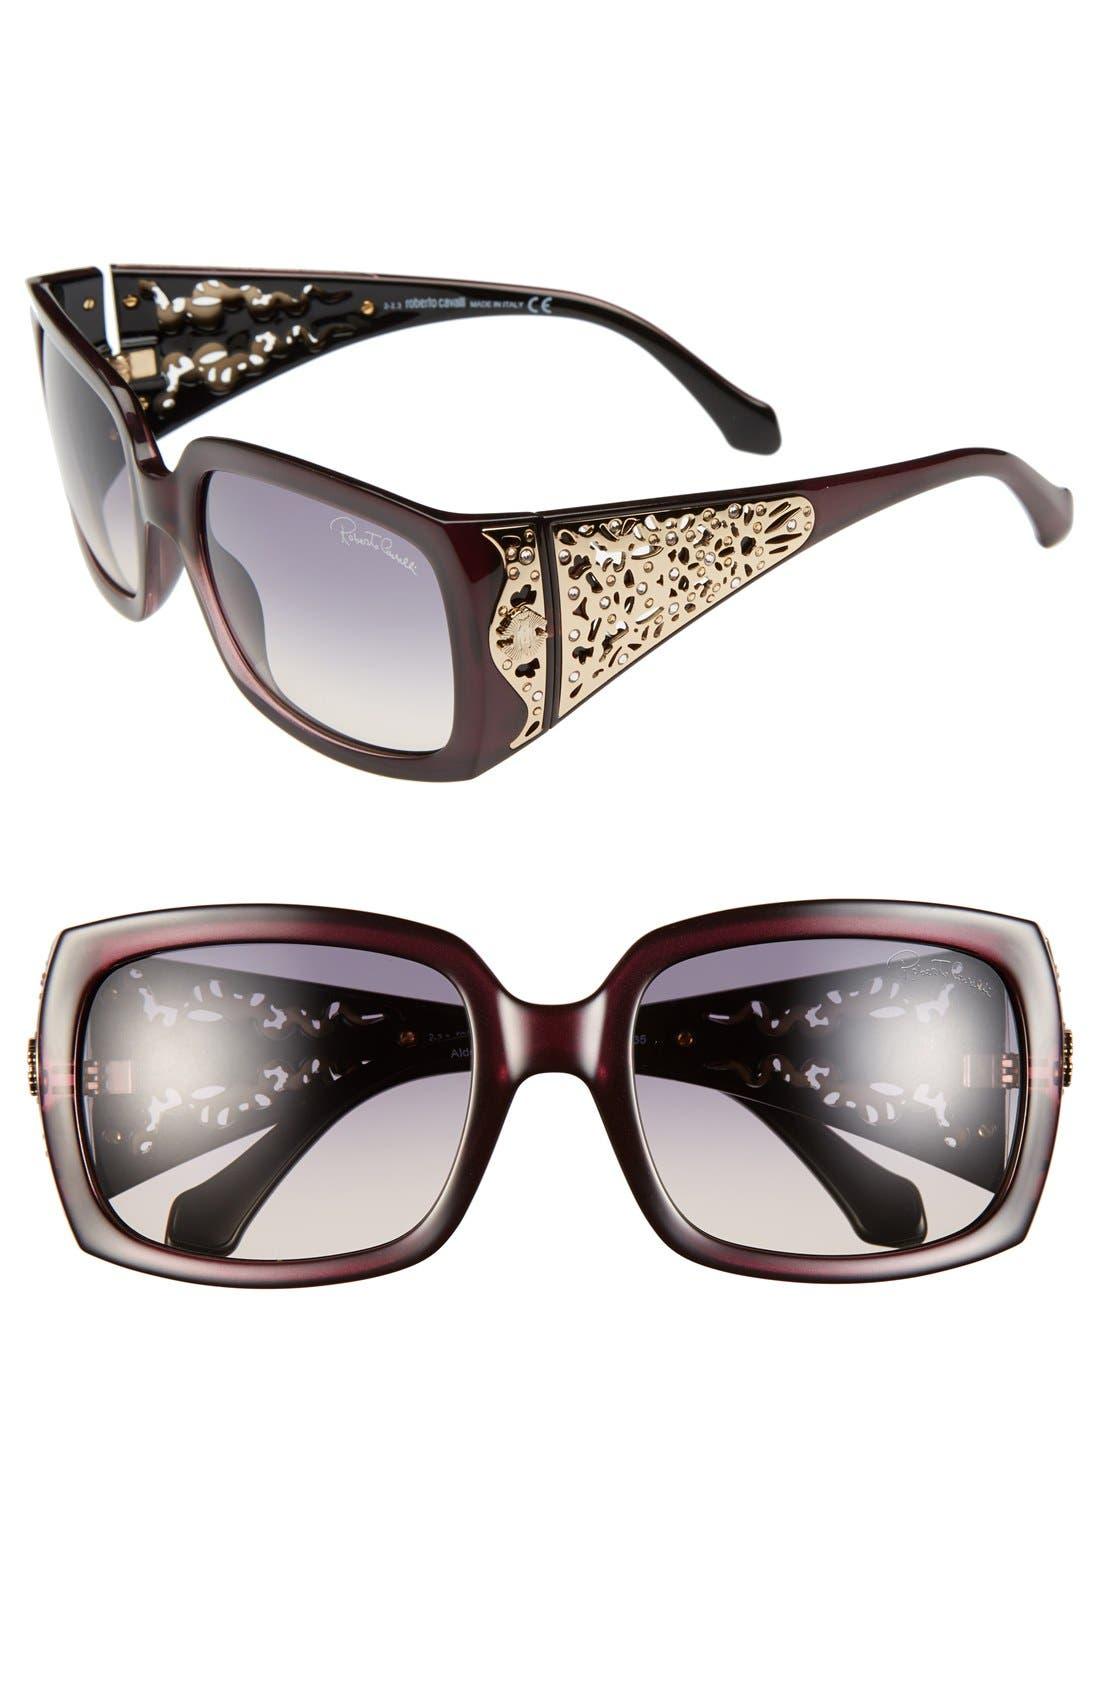 Main Image - Roberto Cavalli 'Aldebaran' 59mm Square Sunglasses